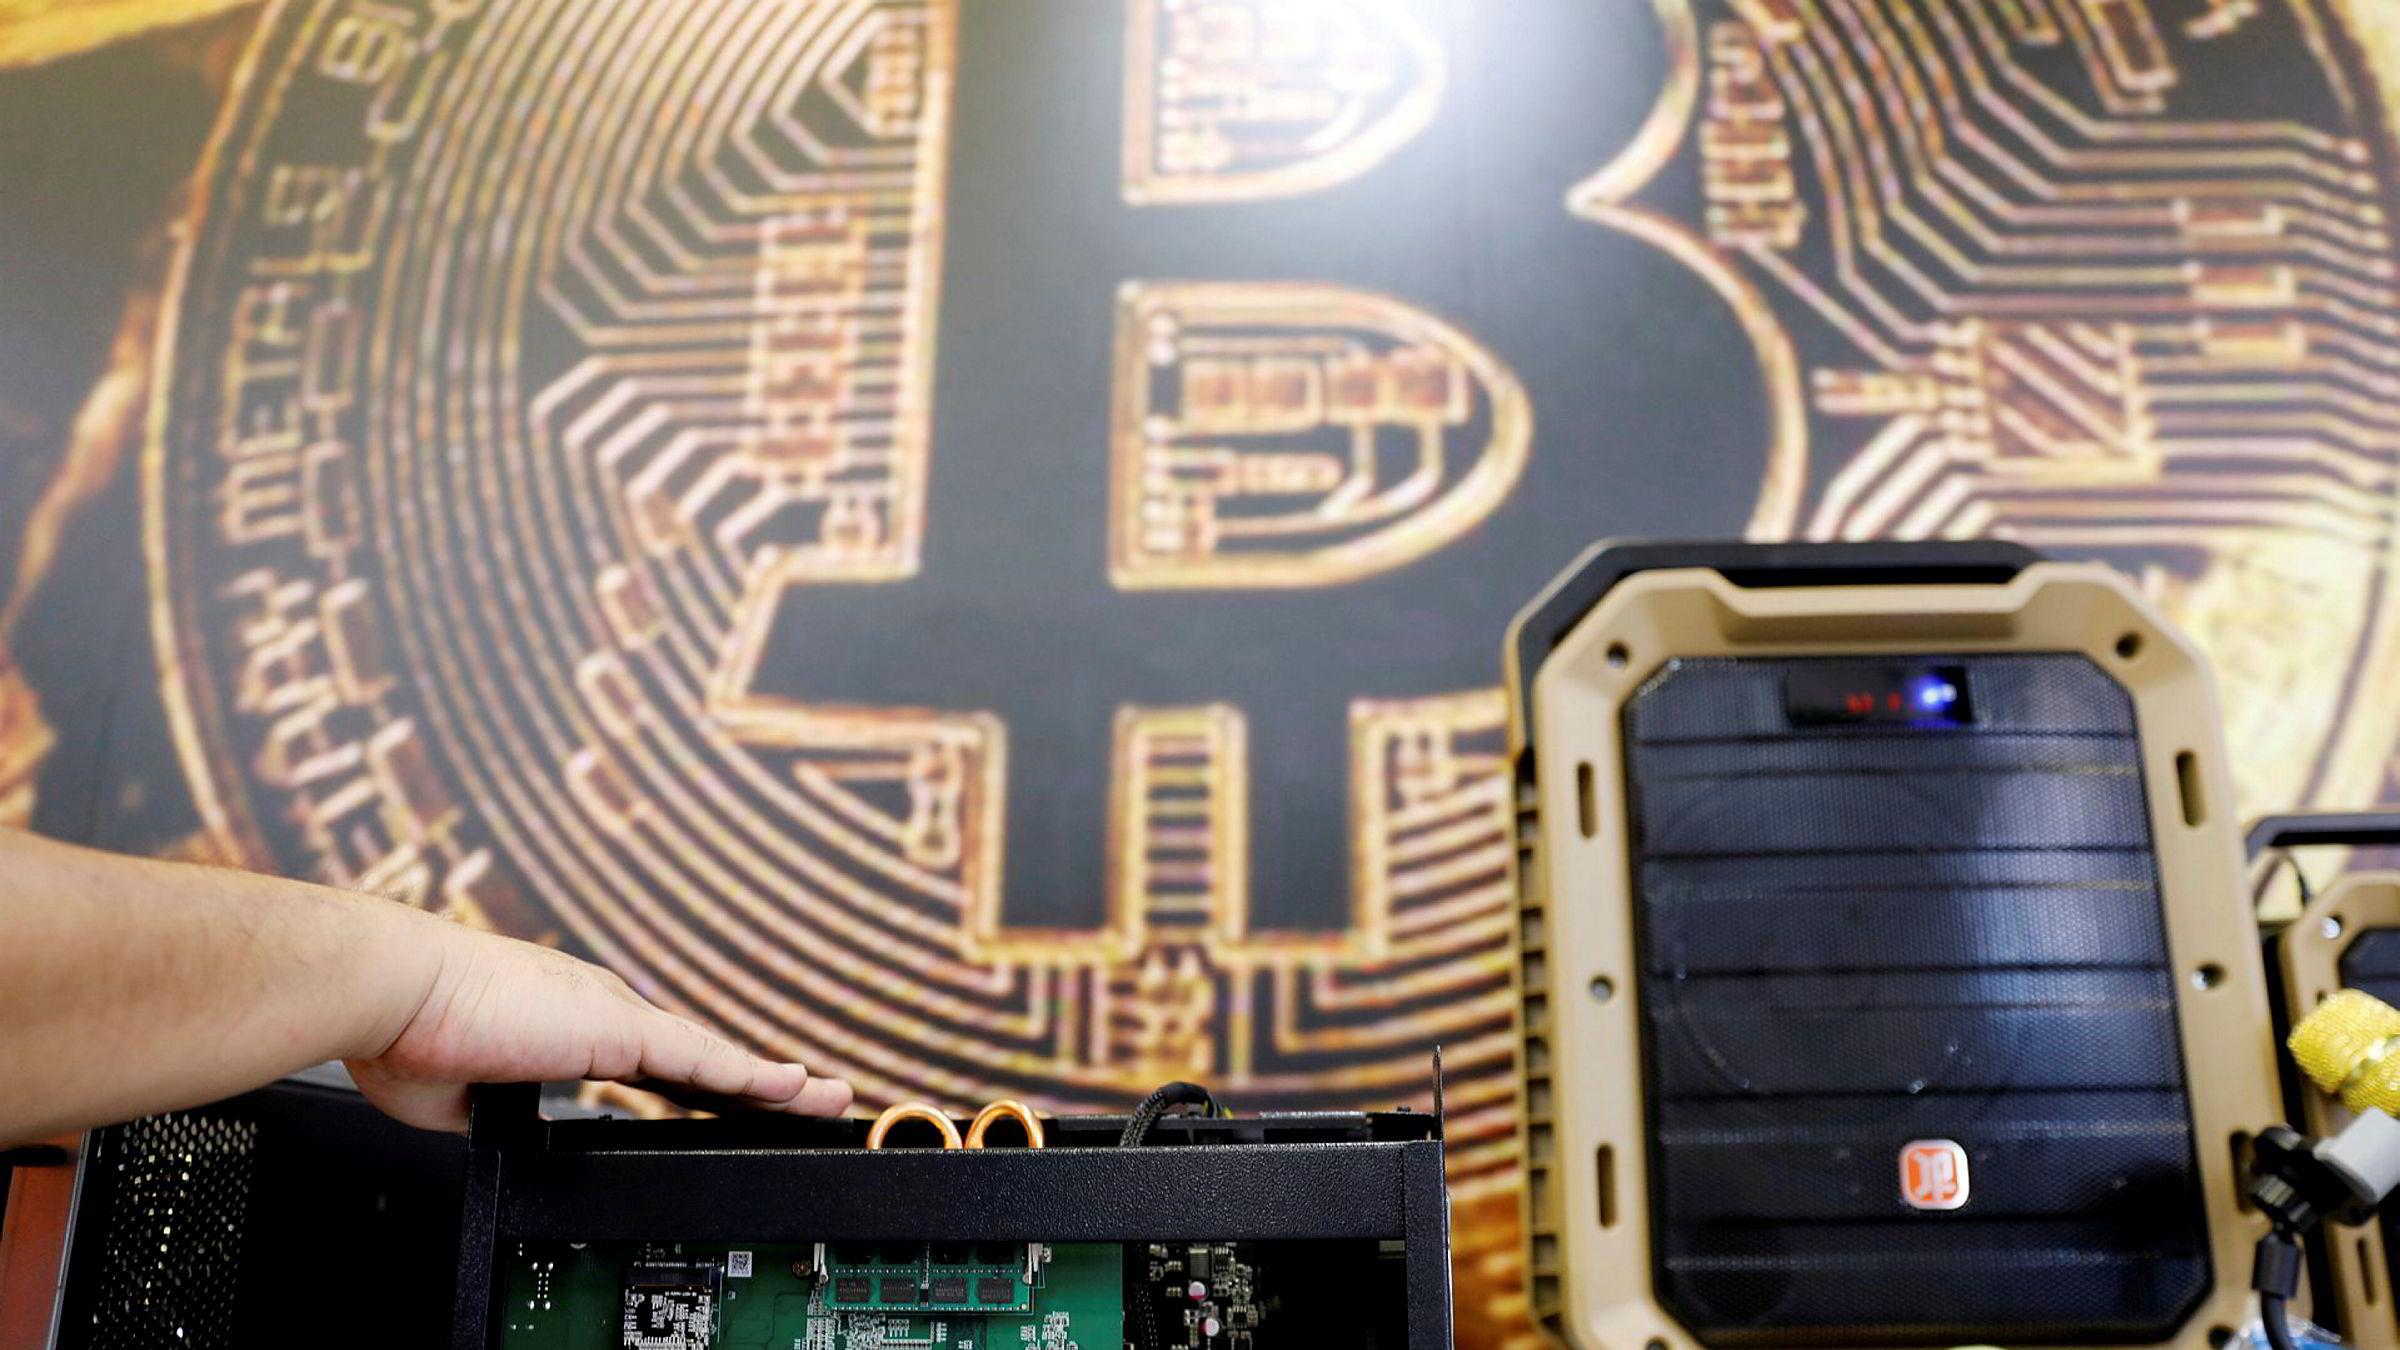 Torsdag koster en bitcoin 6500 dollar.